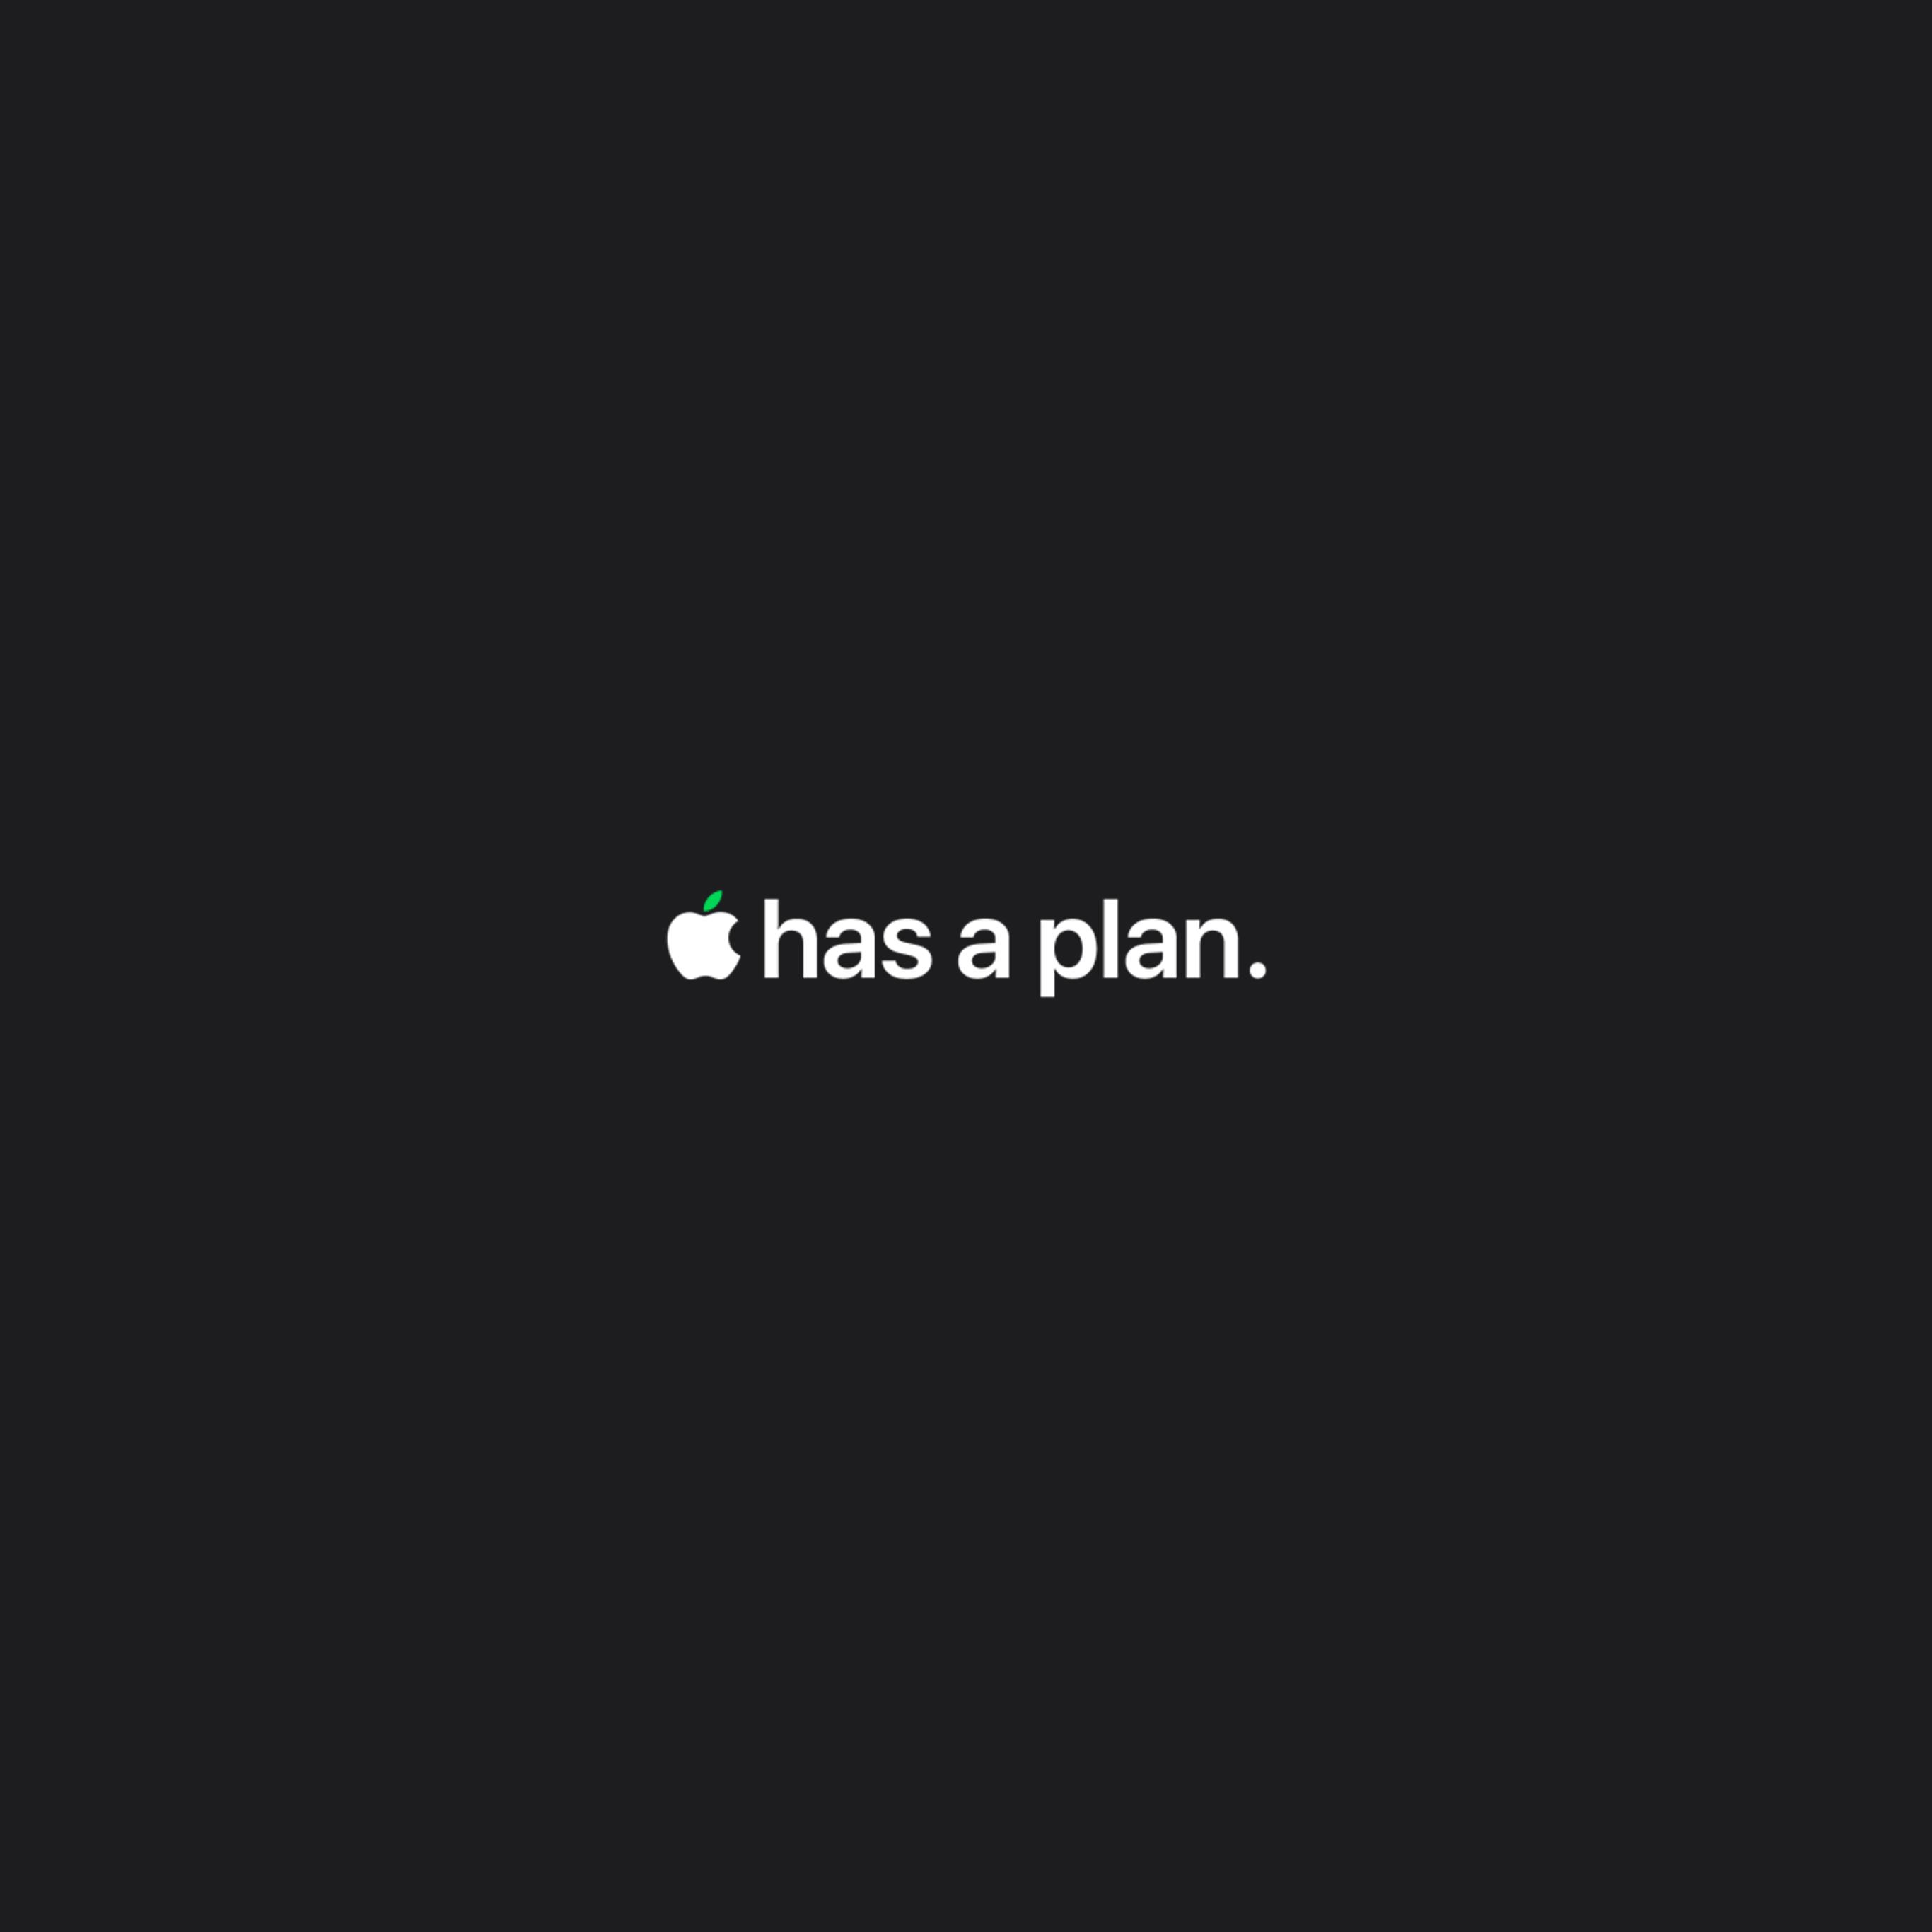 Apple earth day 2021 iPad Pro Wallpaper - Apple has a plan